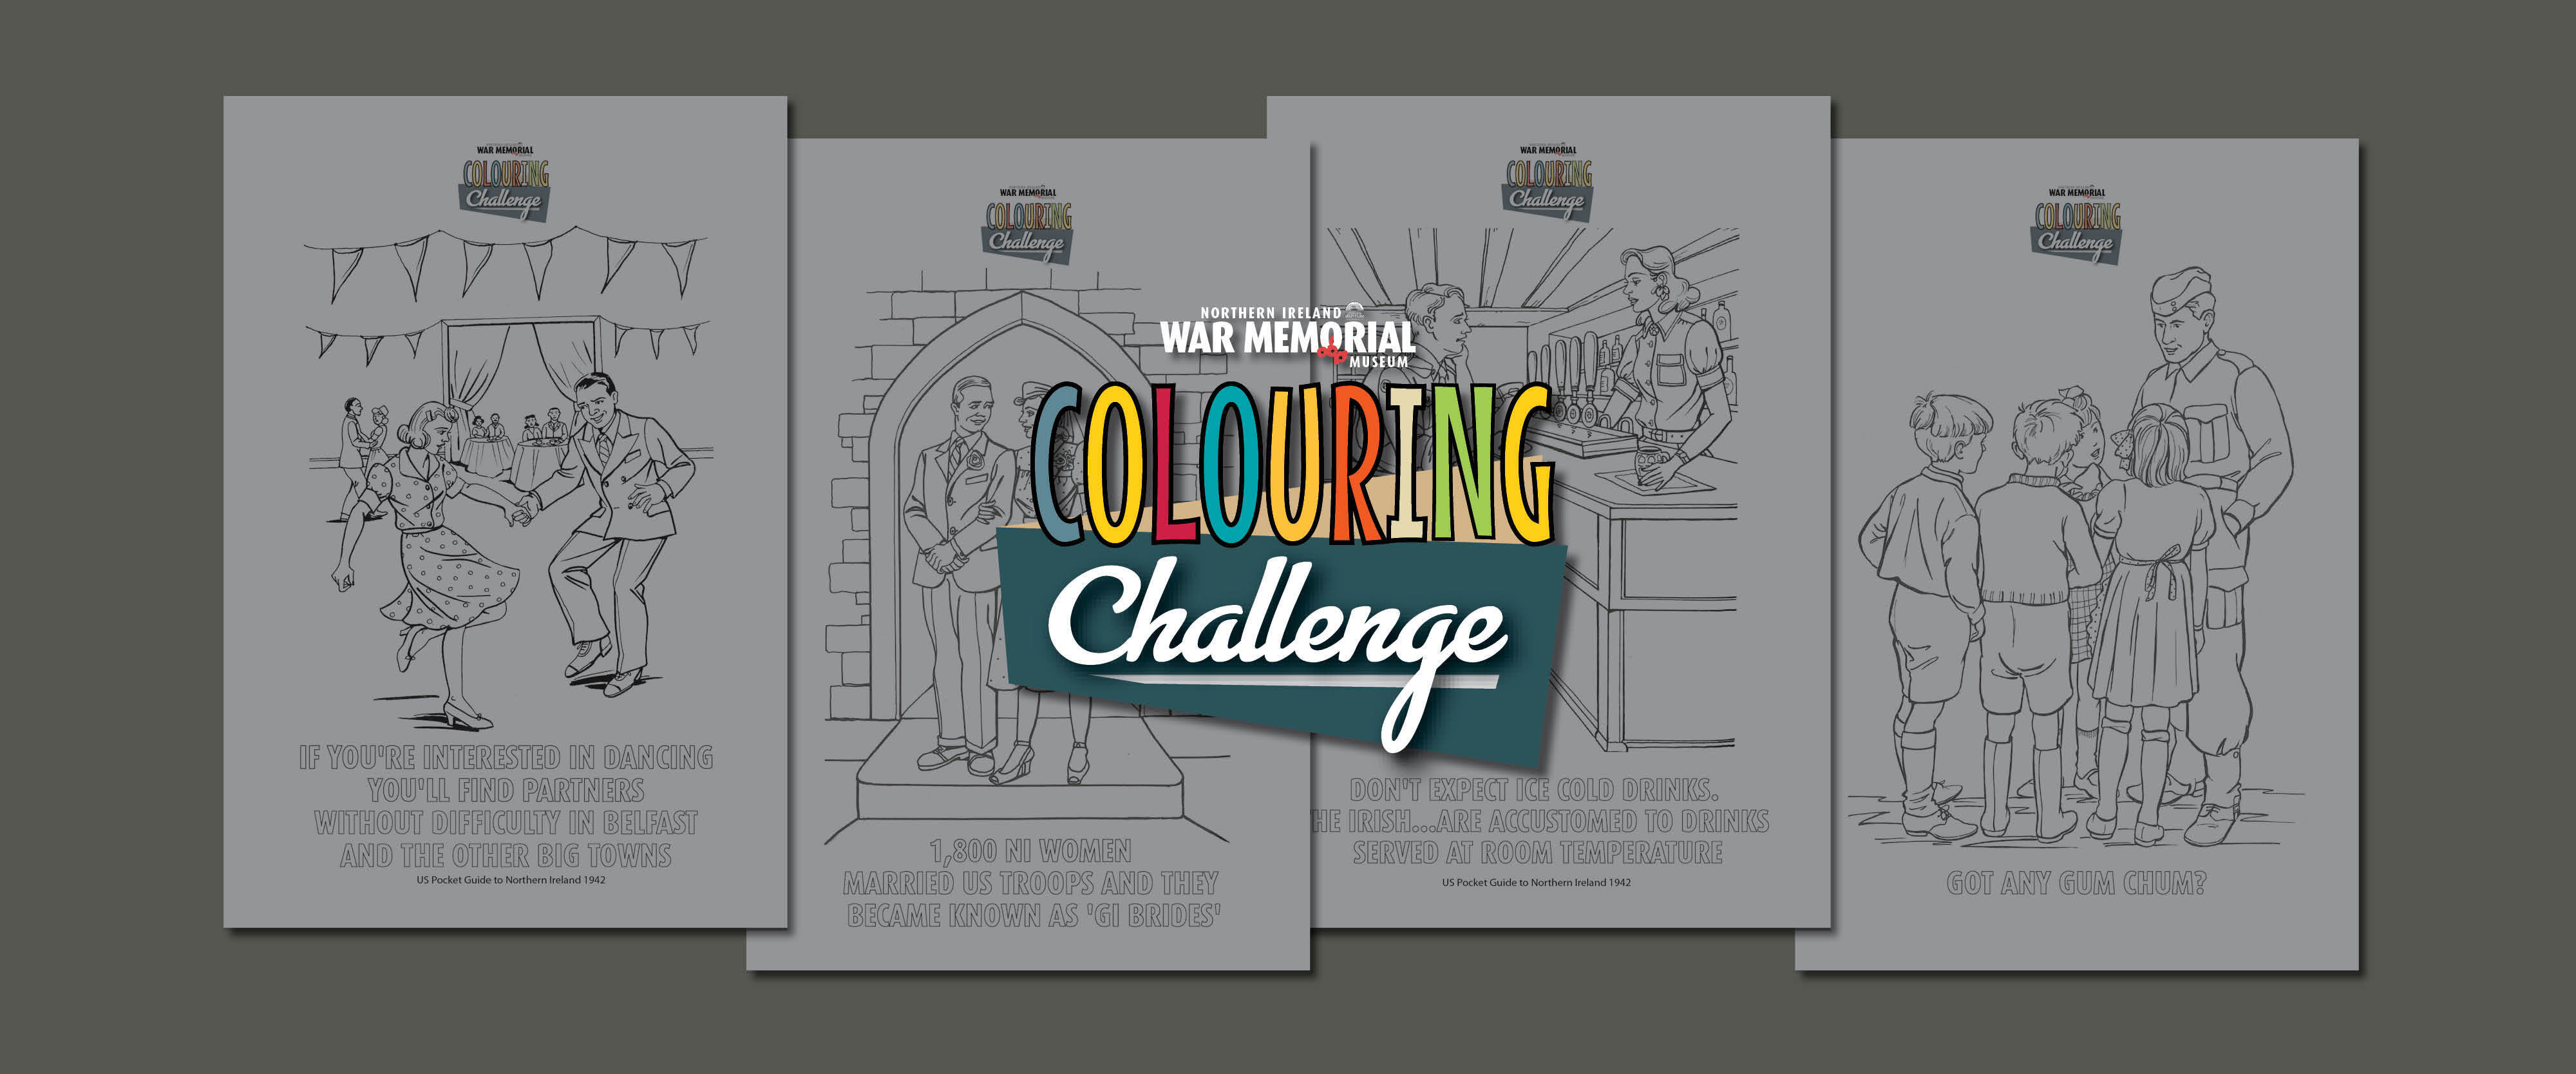 NIWM Colouring Challenge